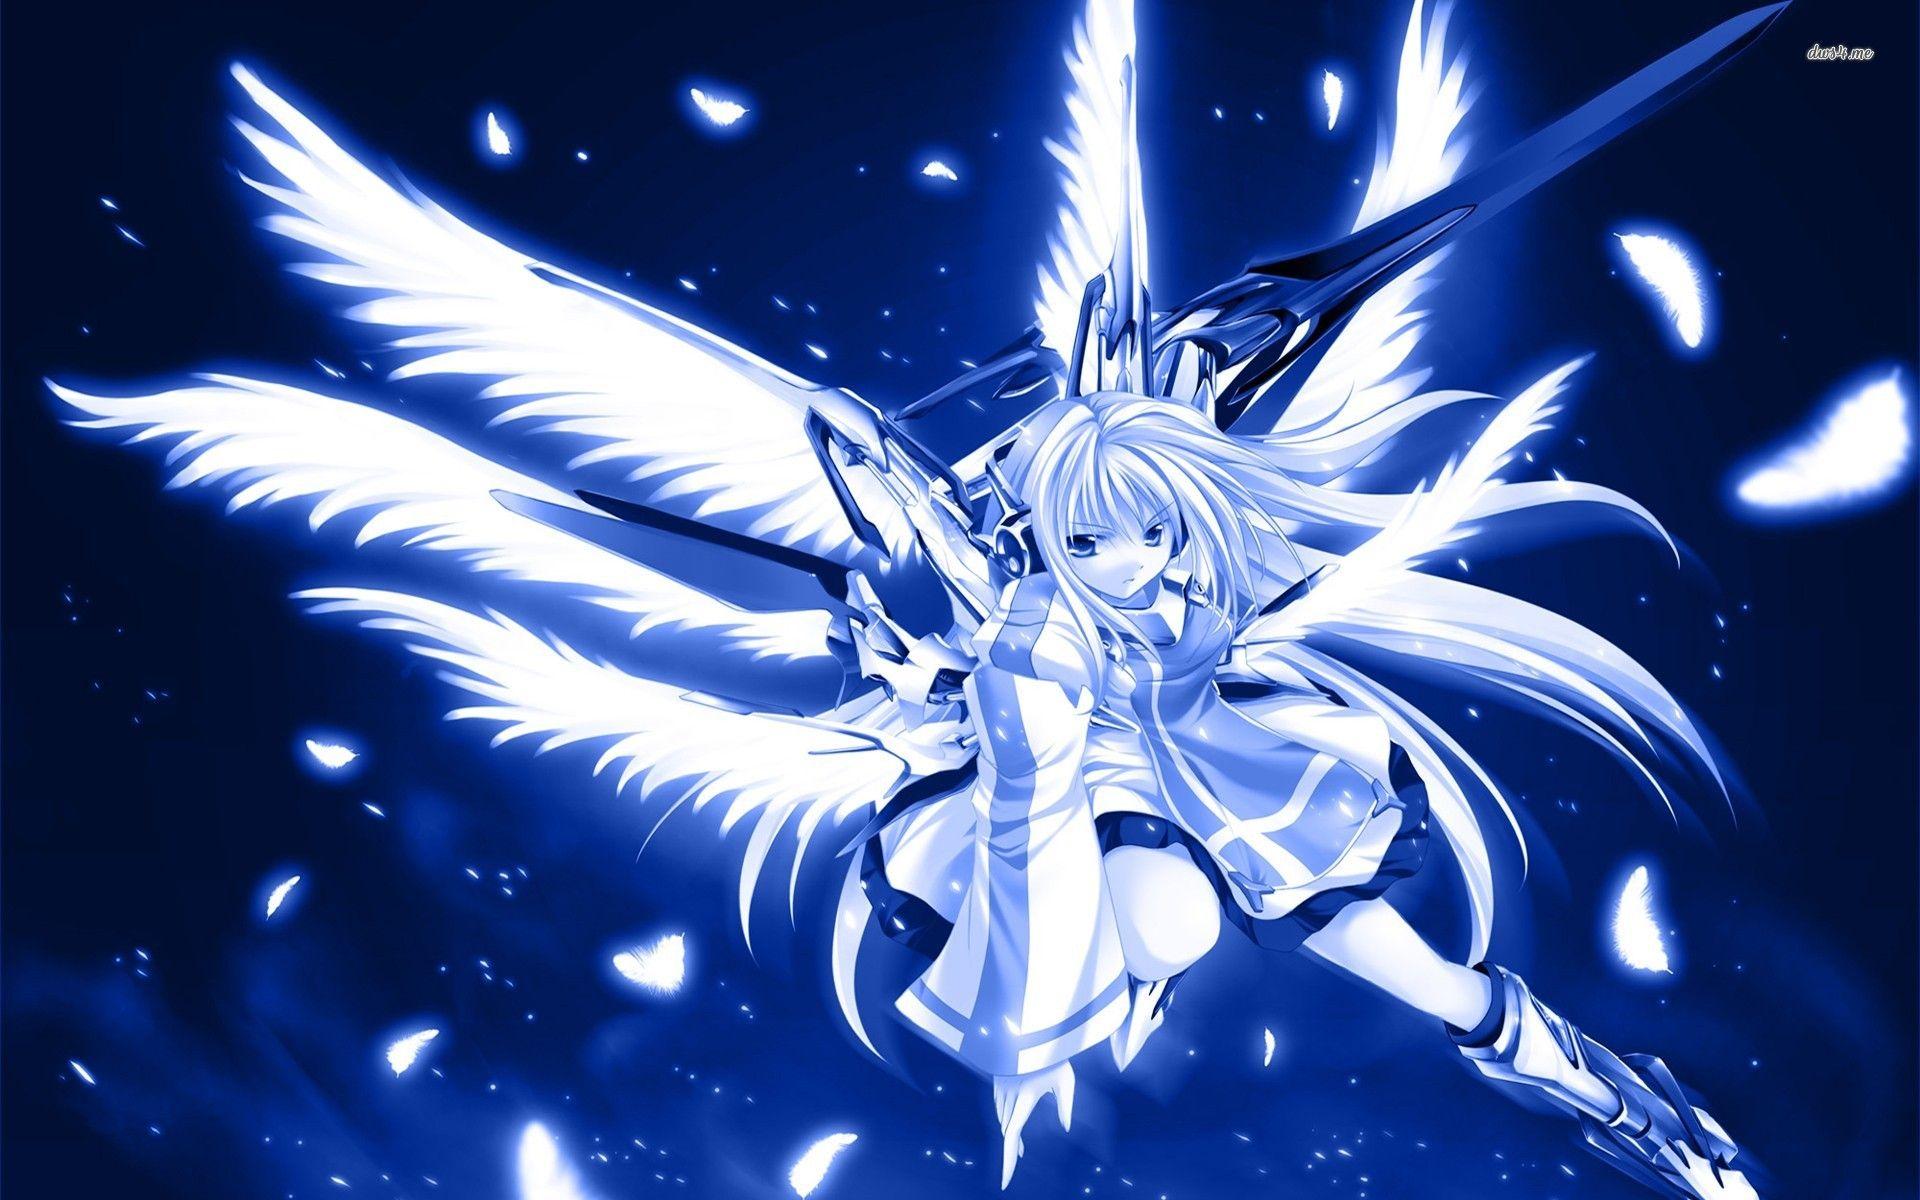 Blue Warrior Angel 19x10 Anime Wallpaper Jpg 19 10 Angel Wallpaper Blue Anime Warriors Wallpaper